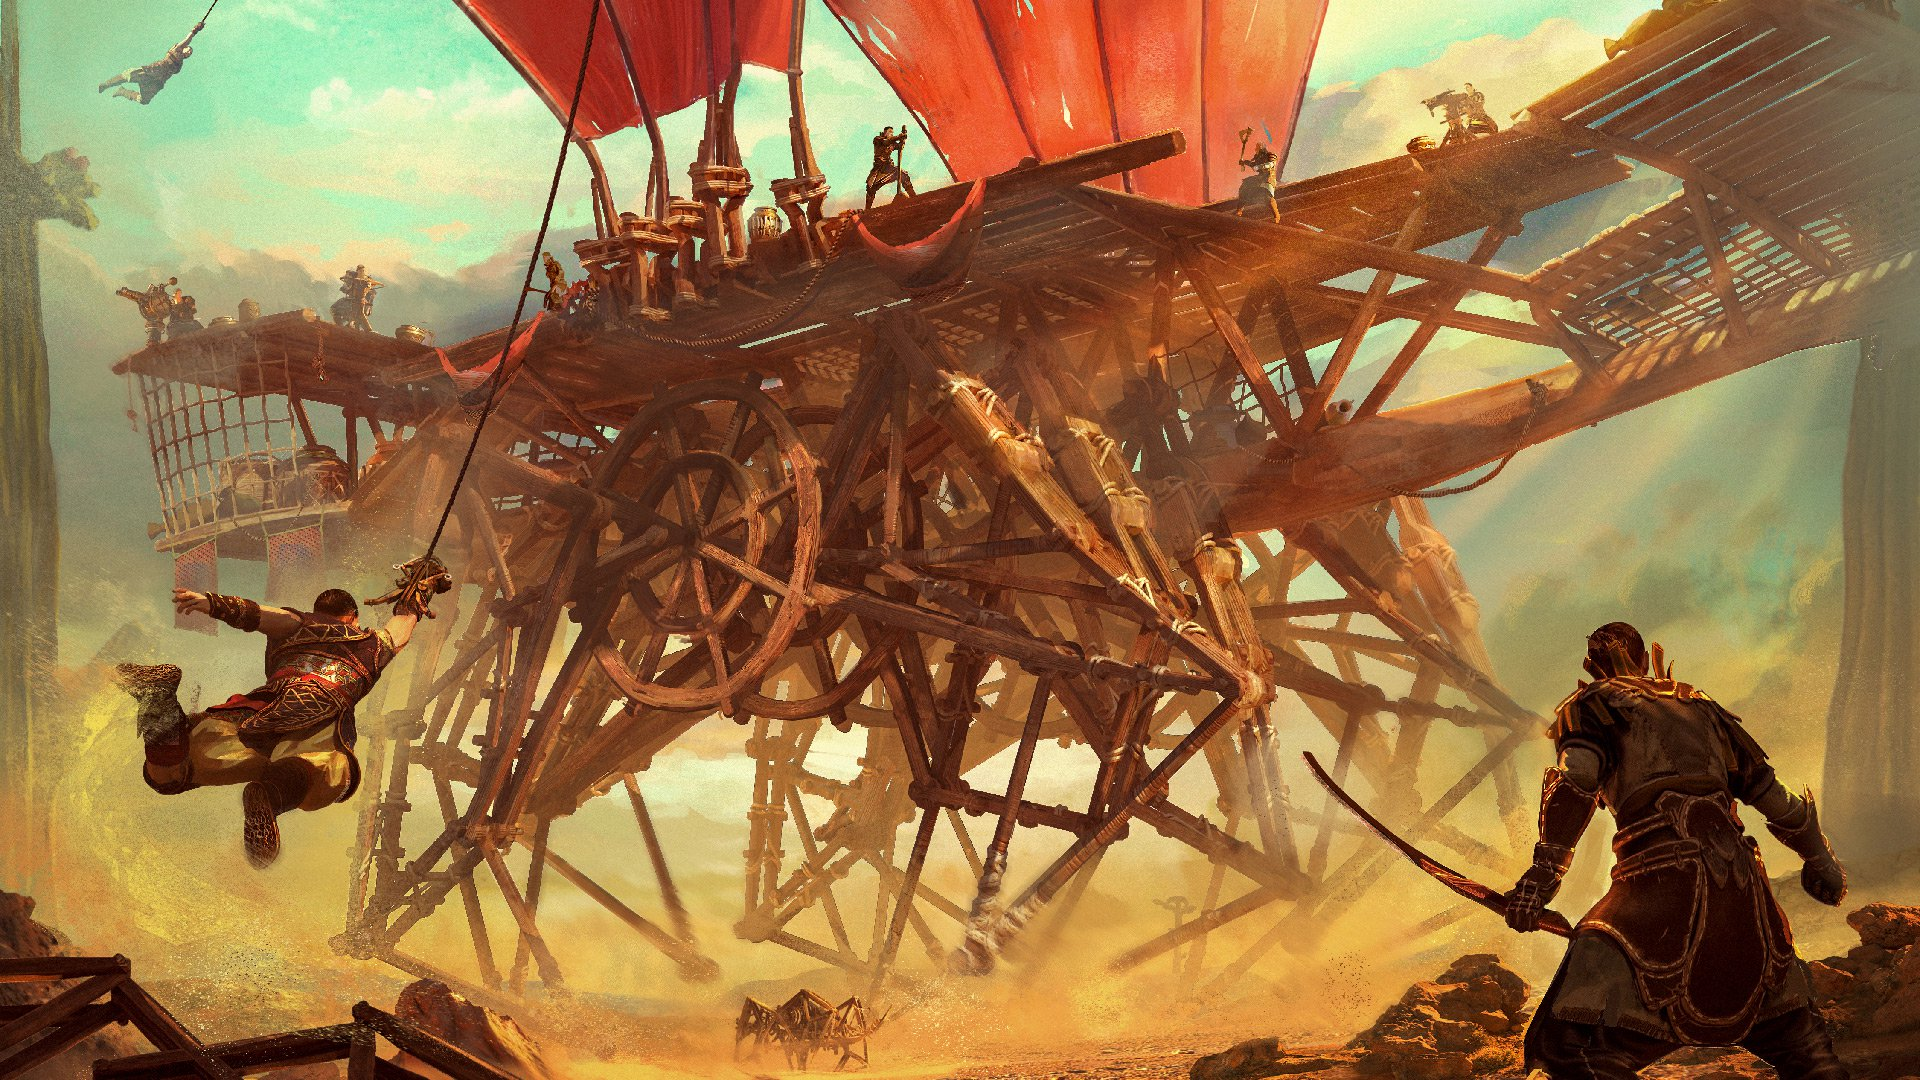 last oasis game wallpaper 68508